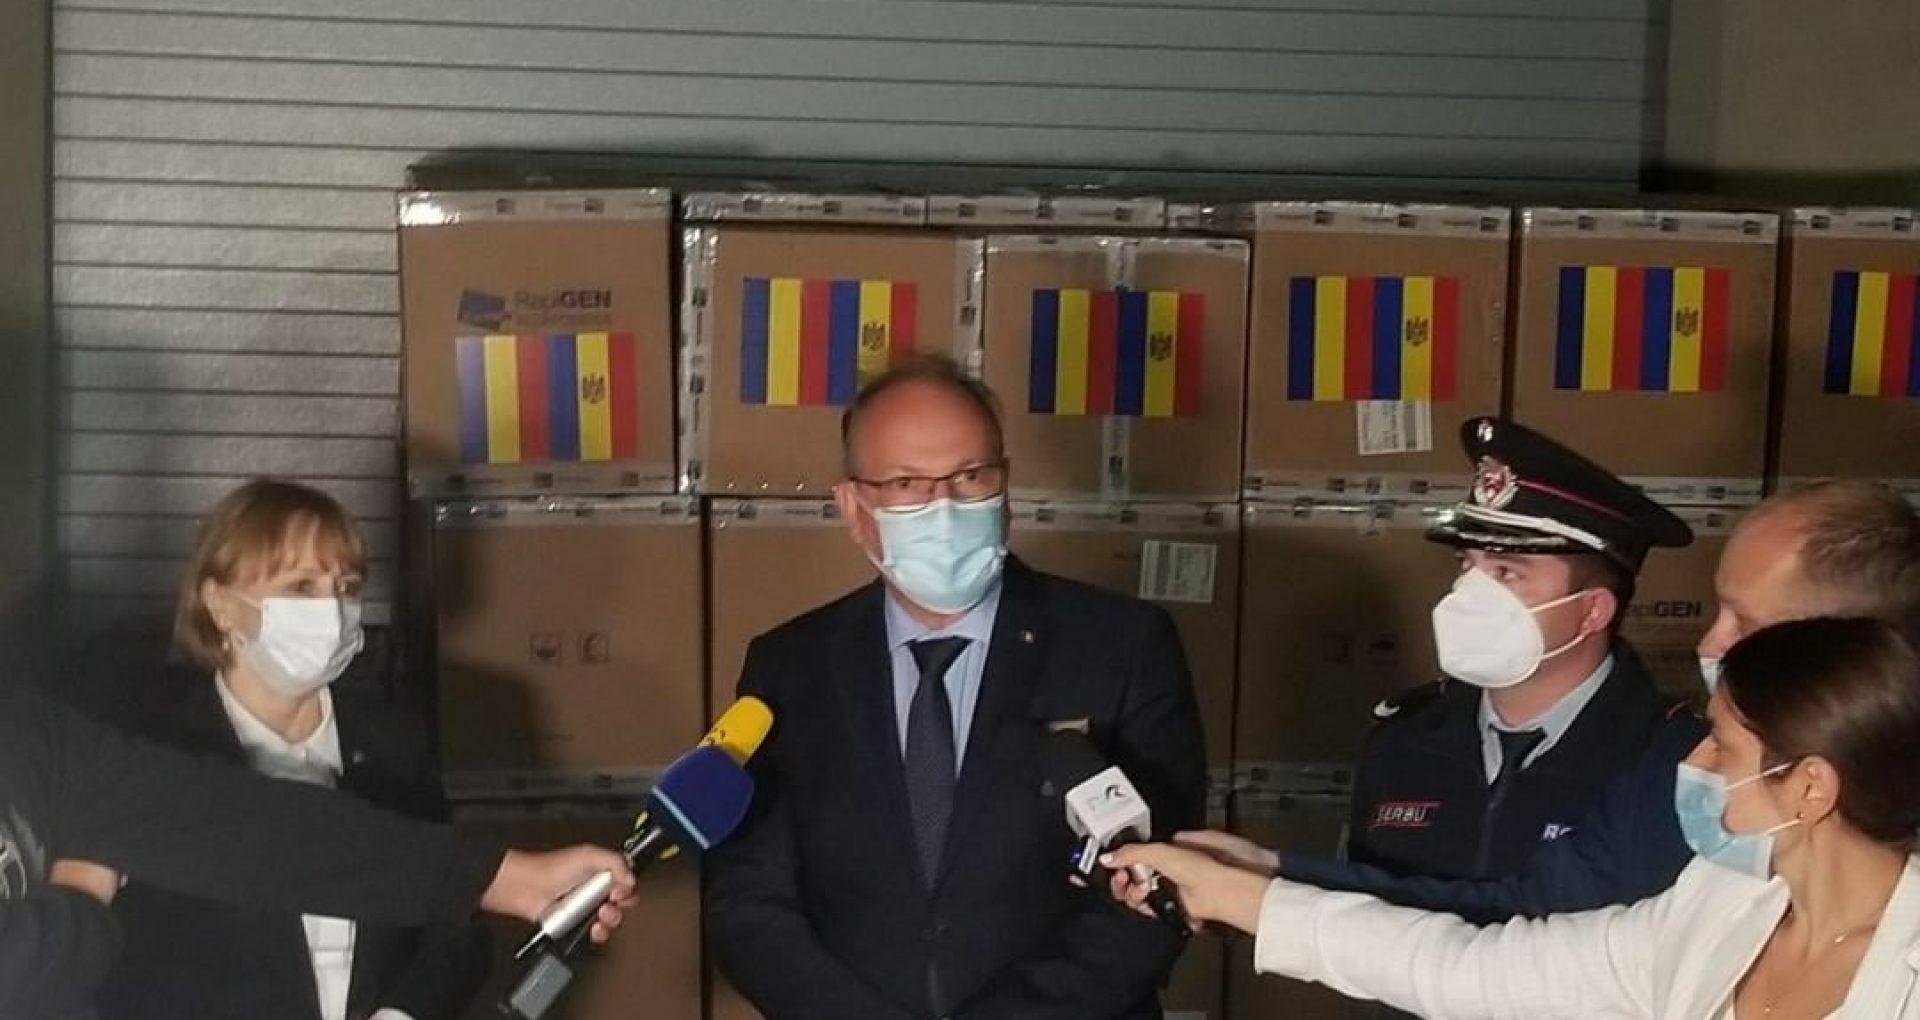 Romania Donates to Moldova 100,000 COVID-19 Rapid Antigen Tests